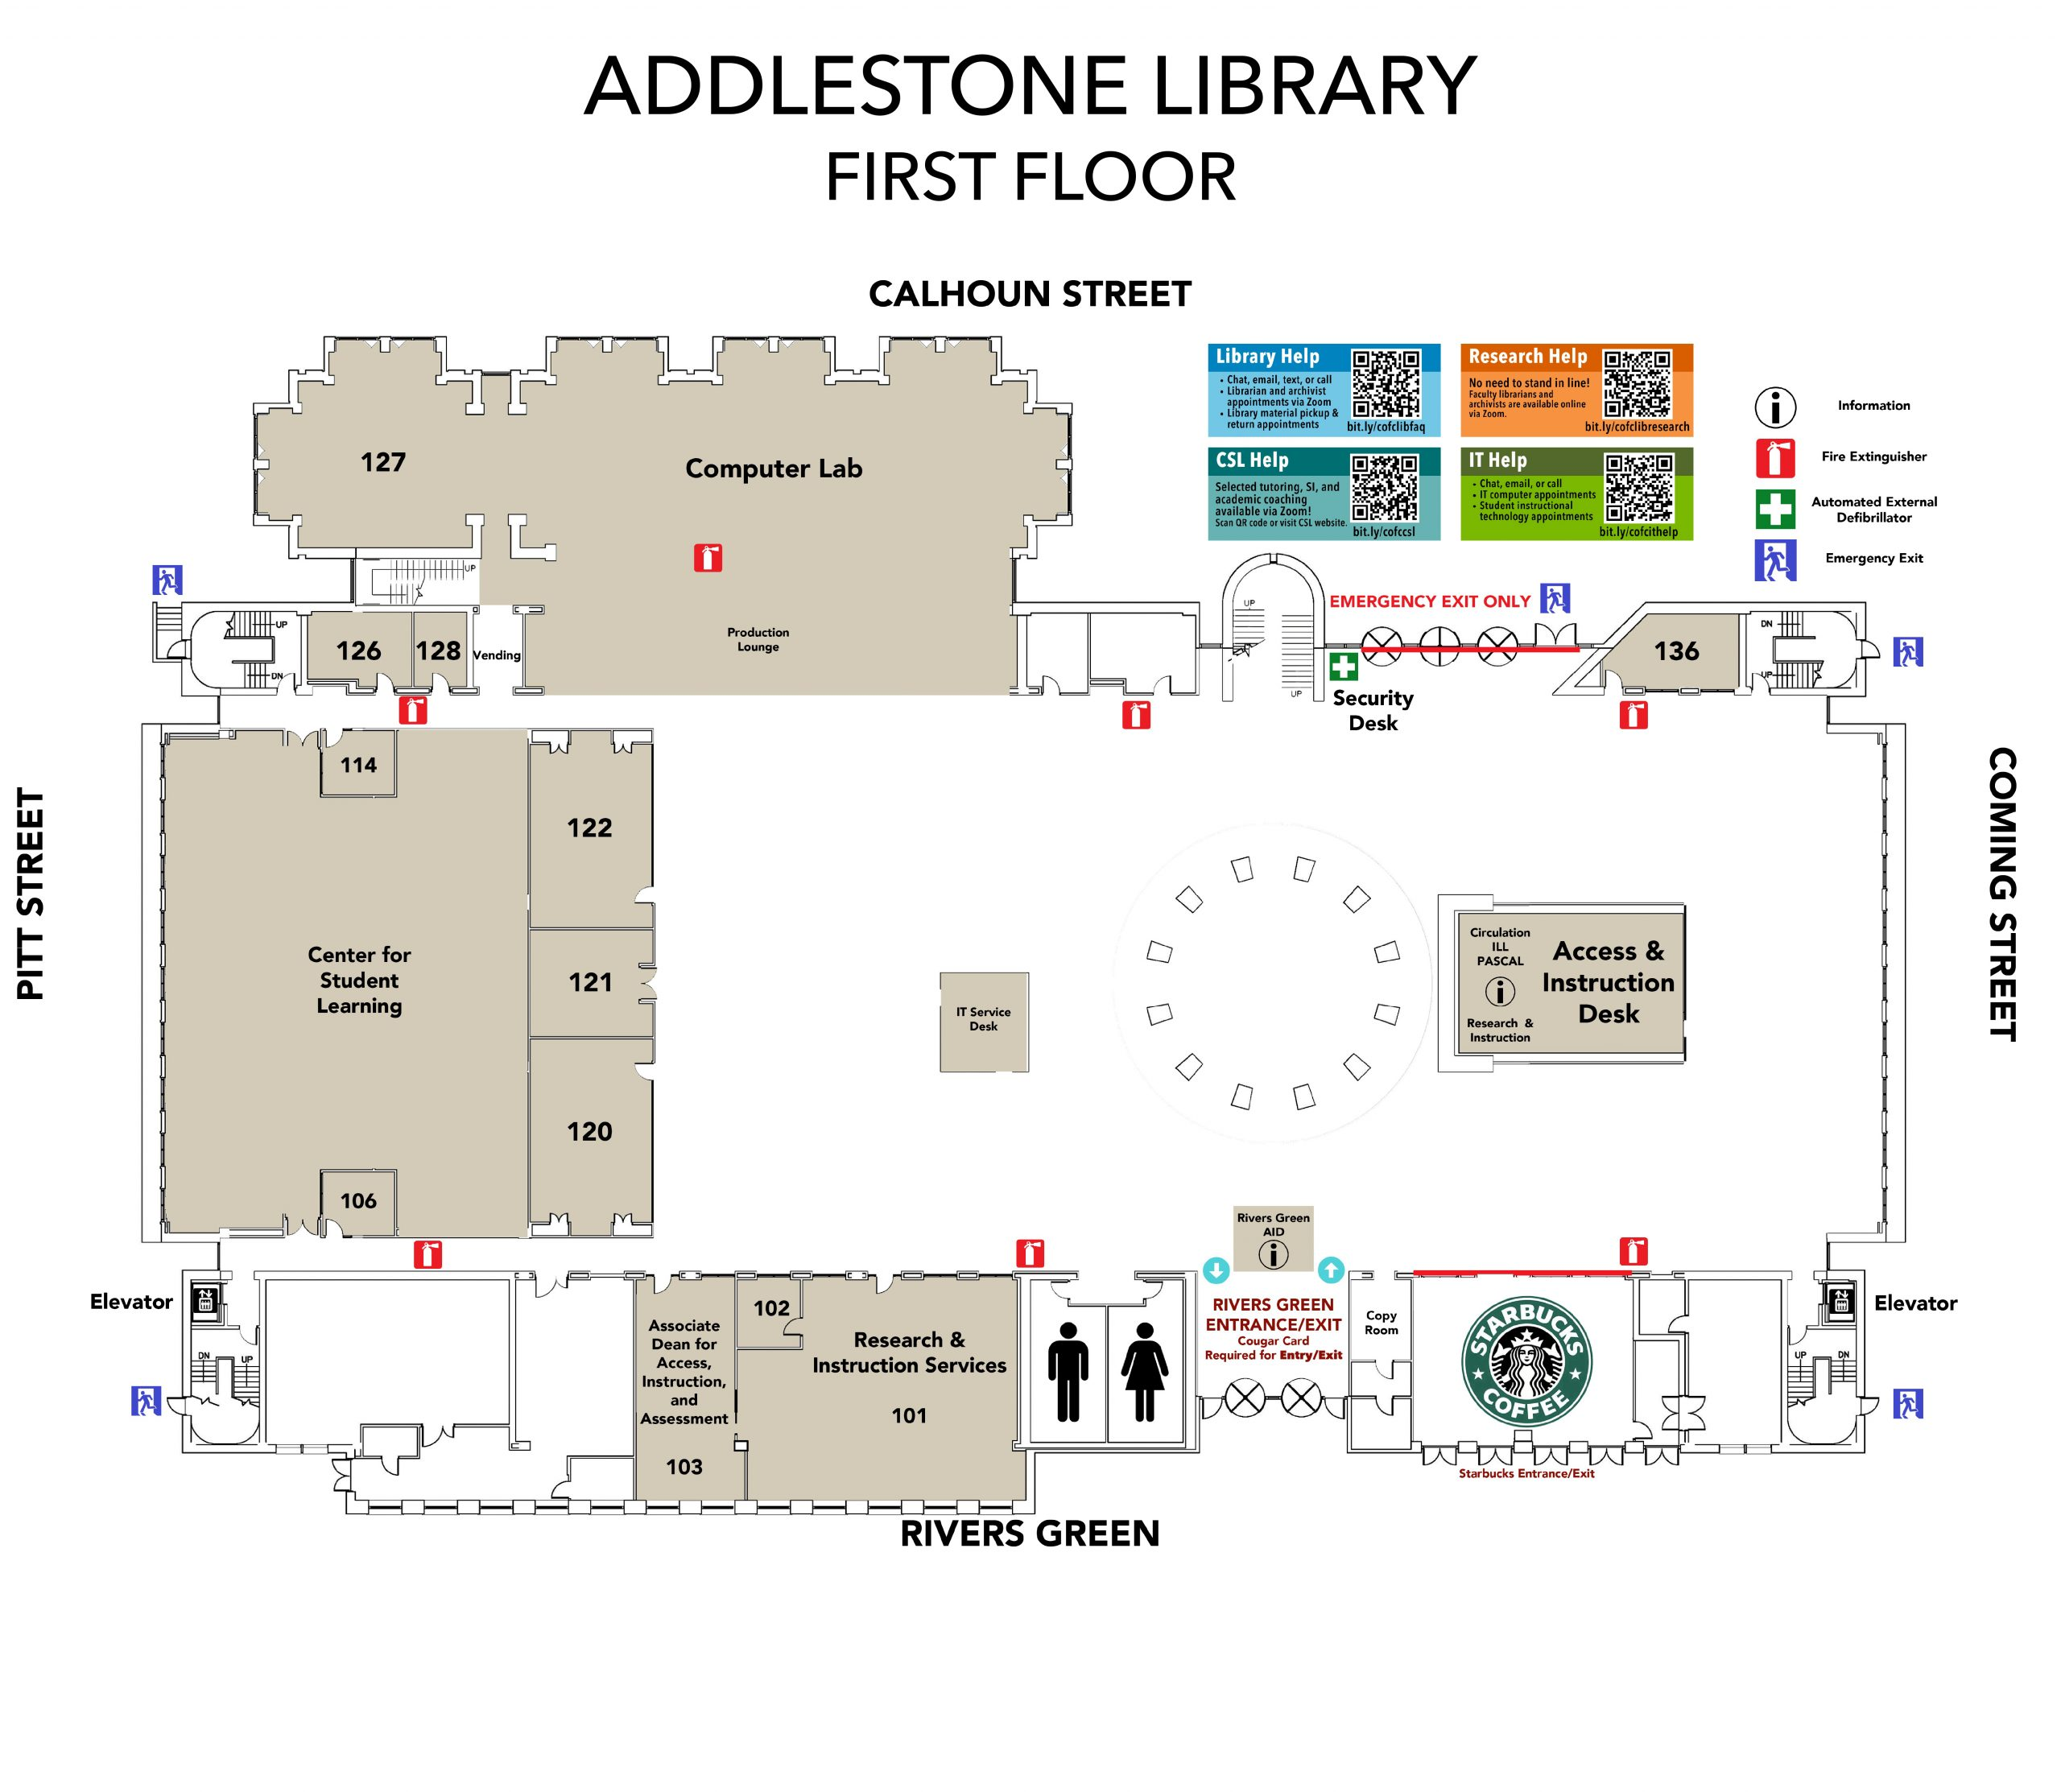 Addlestone Library Floorplans Level 1